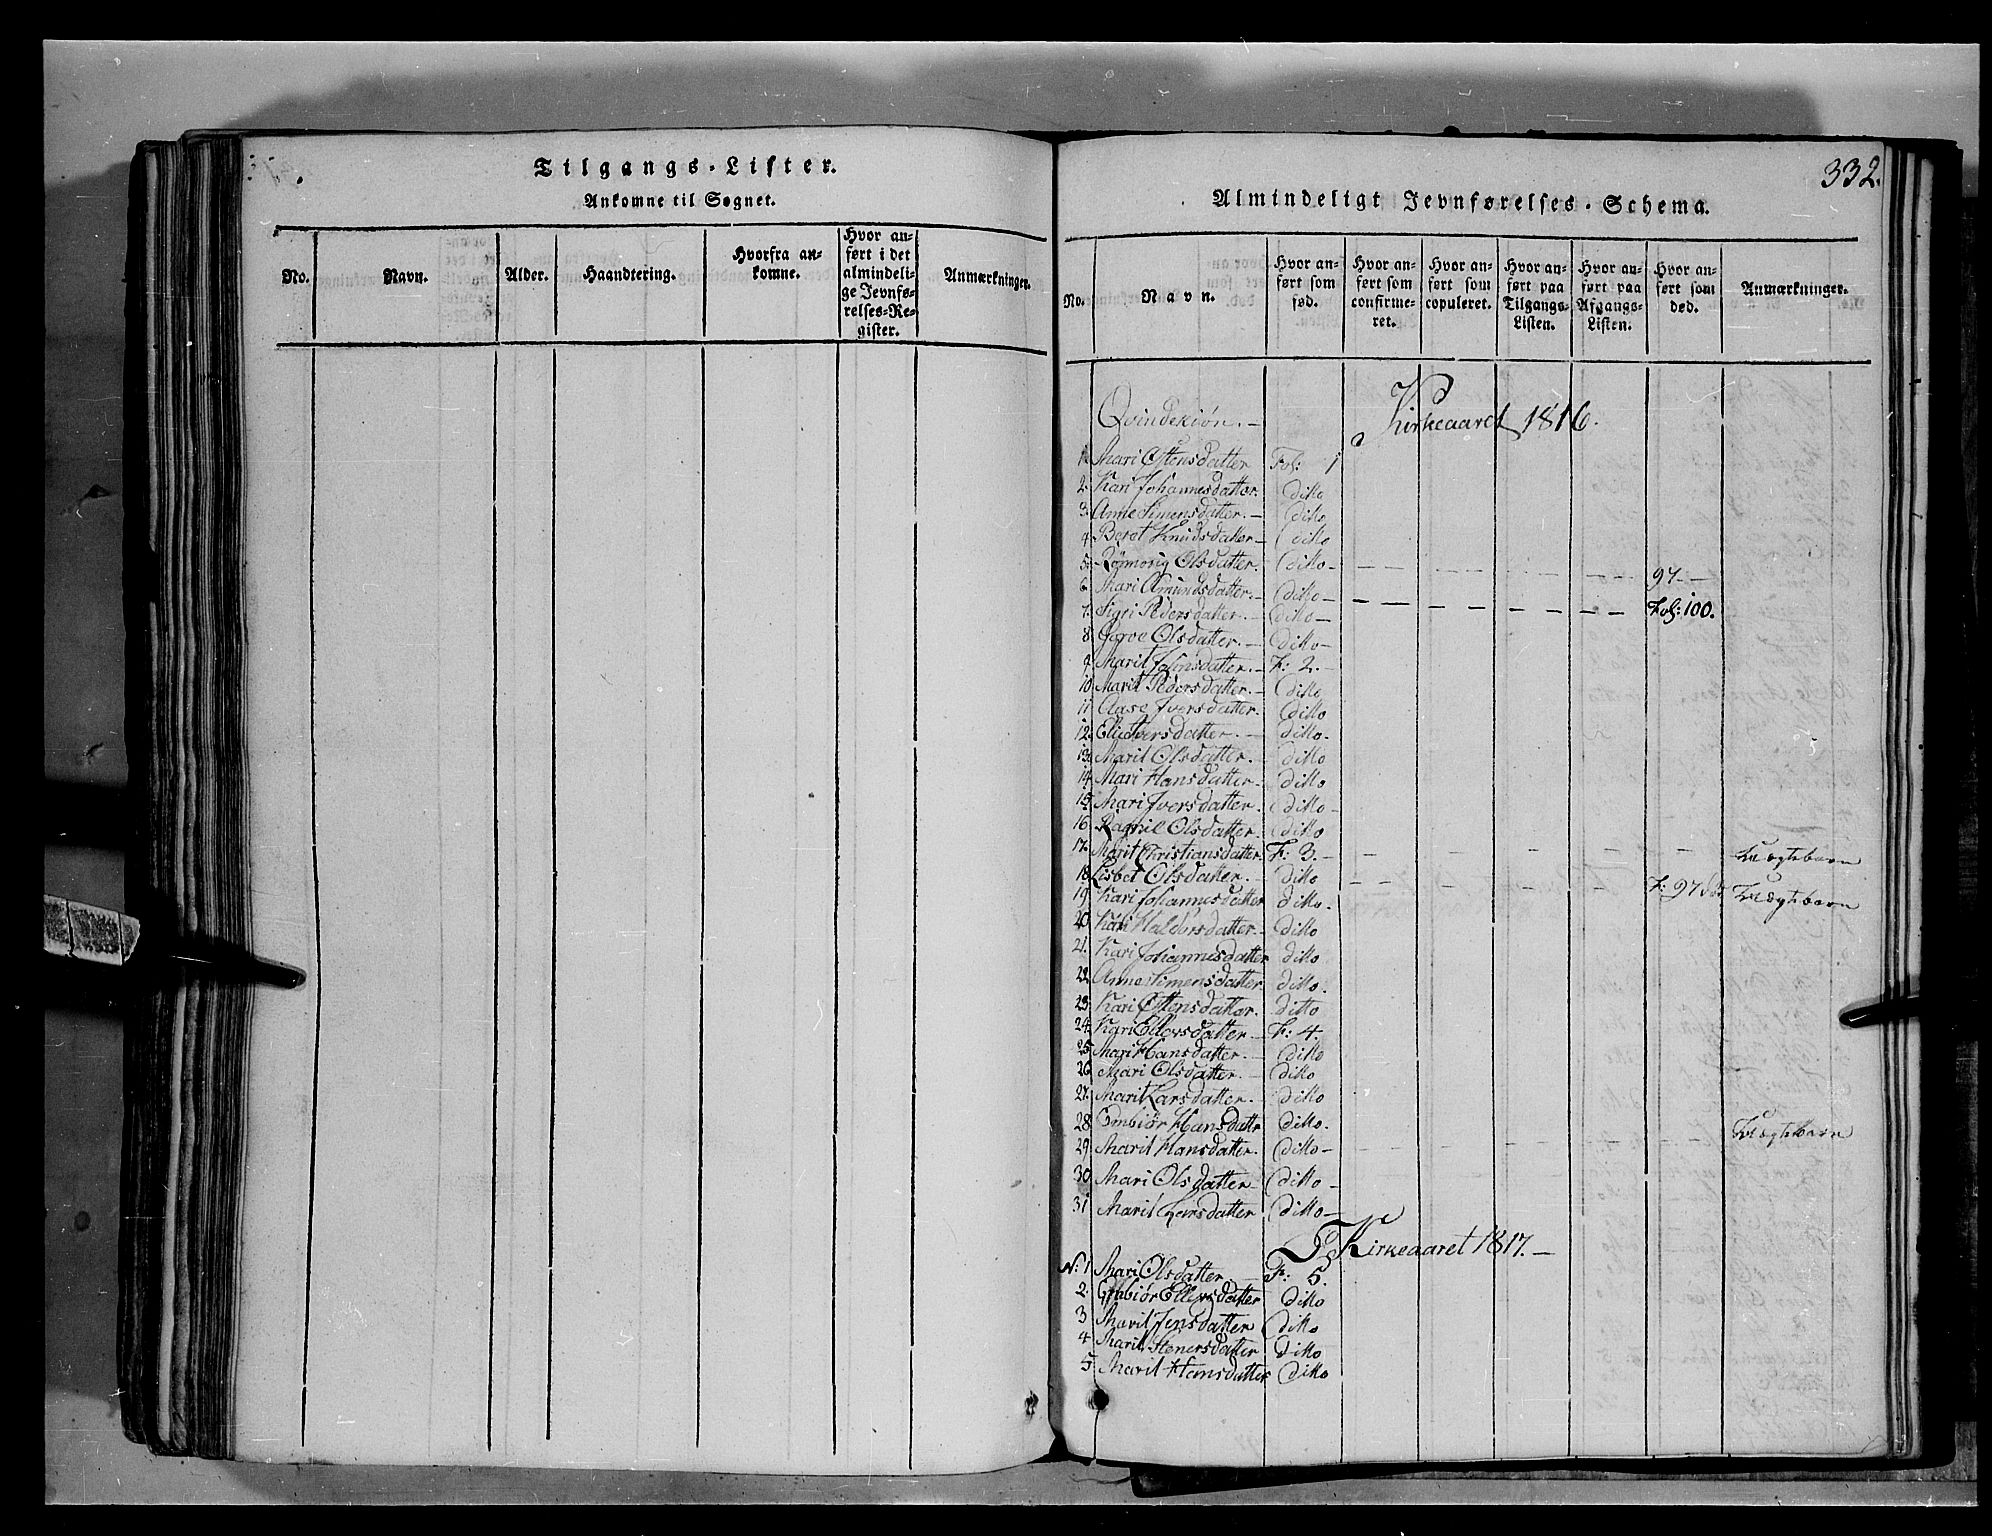 SAH, Fron prestekontor, H/Ha/Hab/L0004: Klokkerbok nr. 4, 1816-1850, s. 332